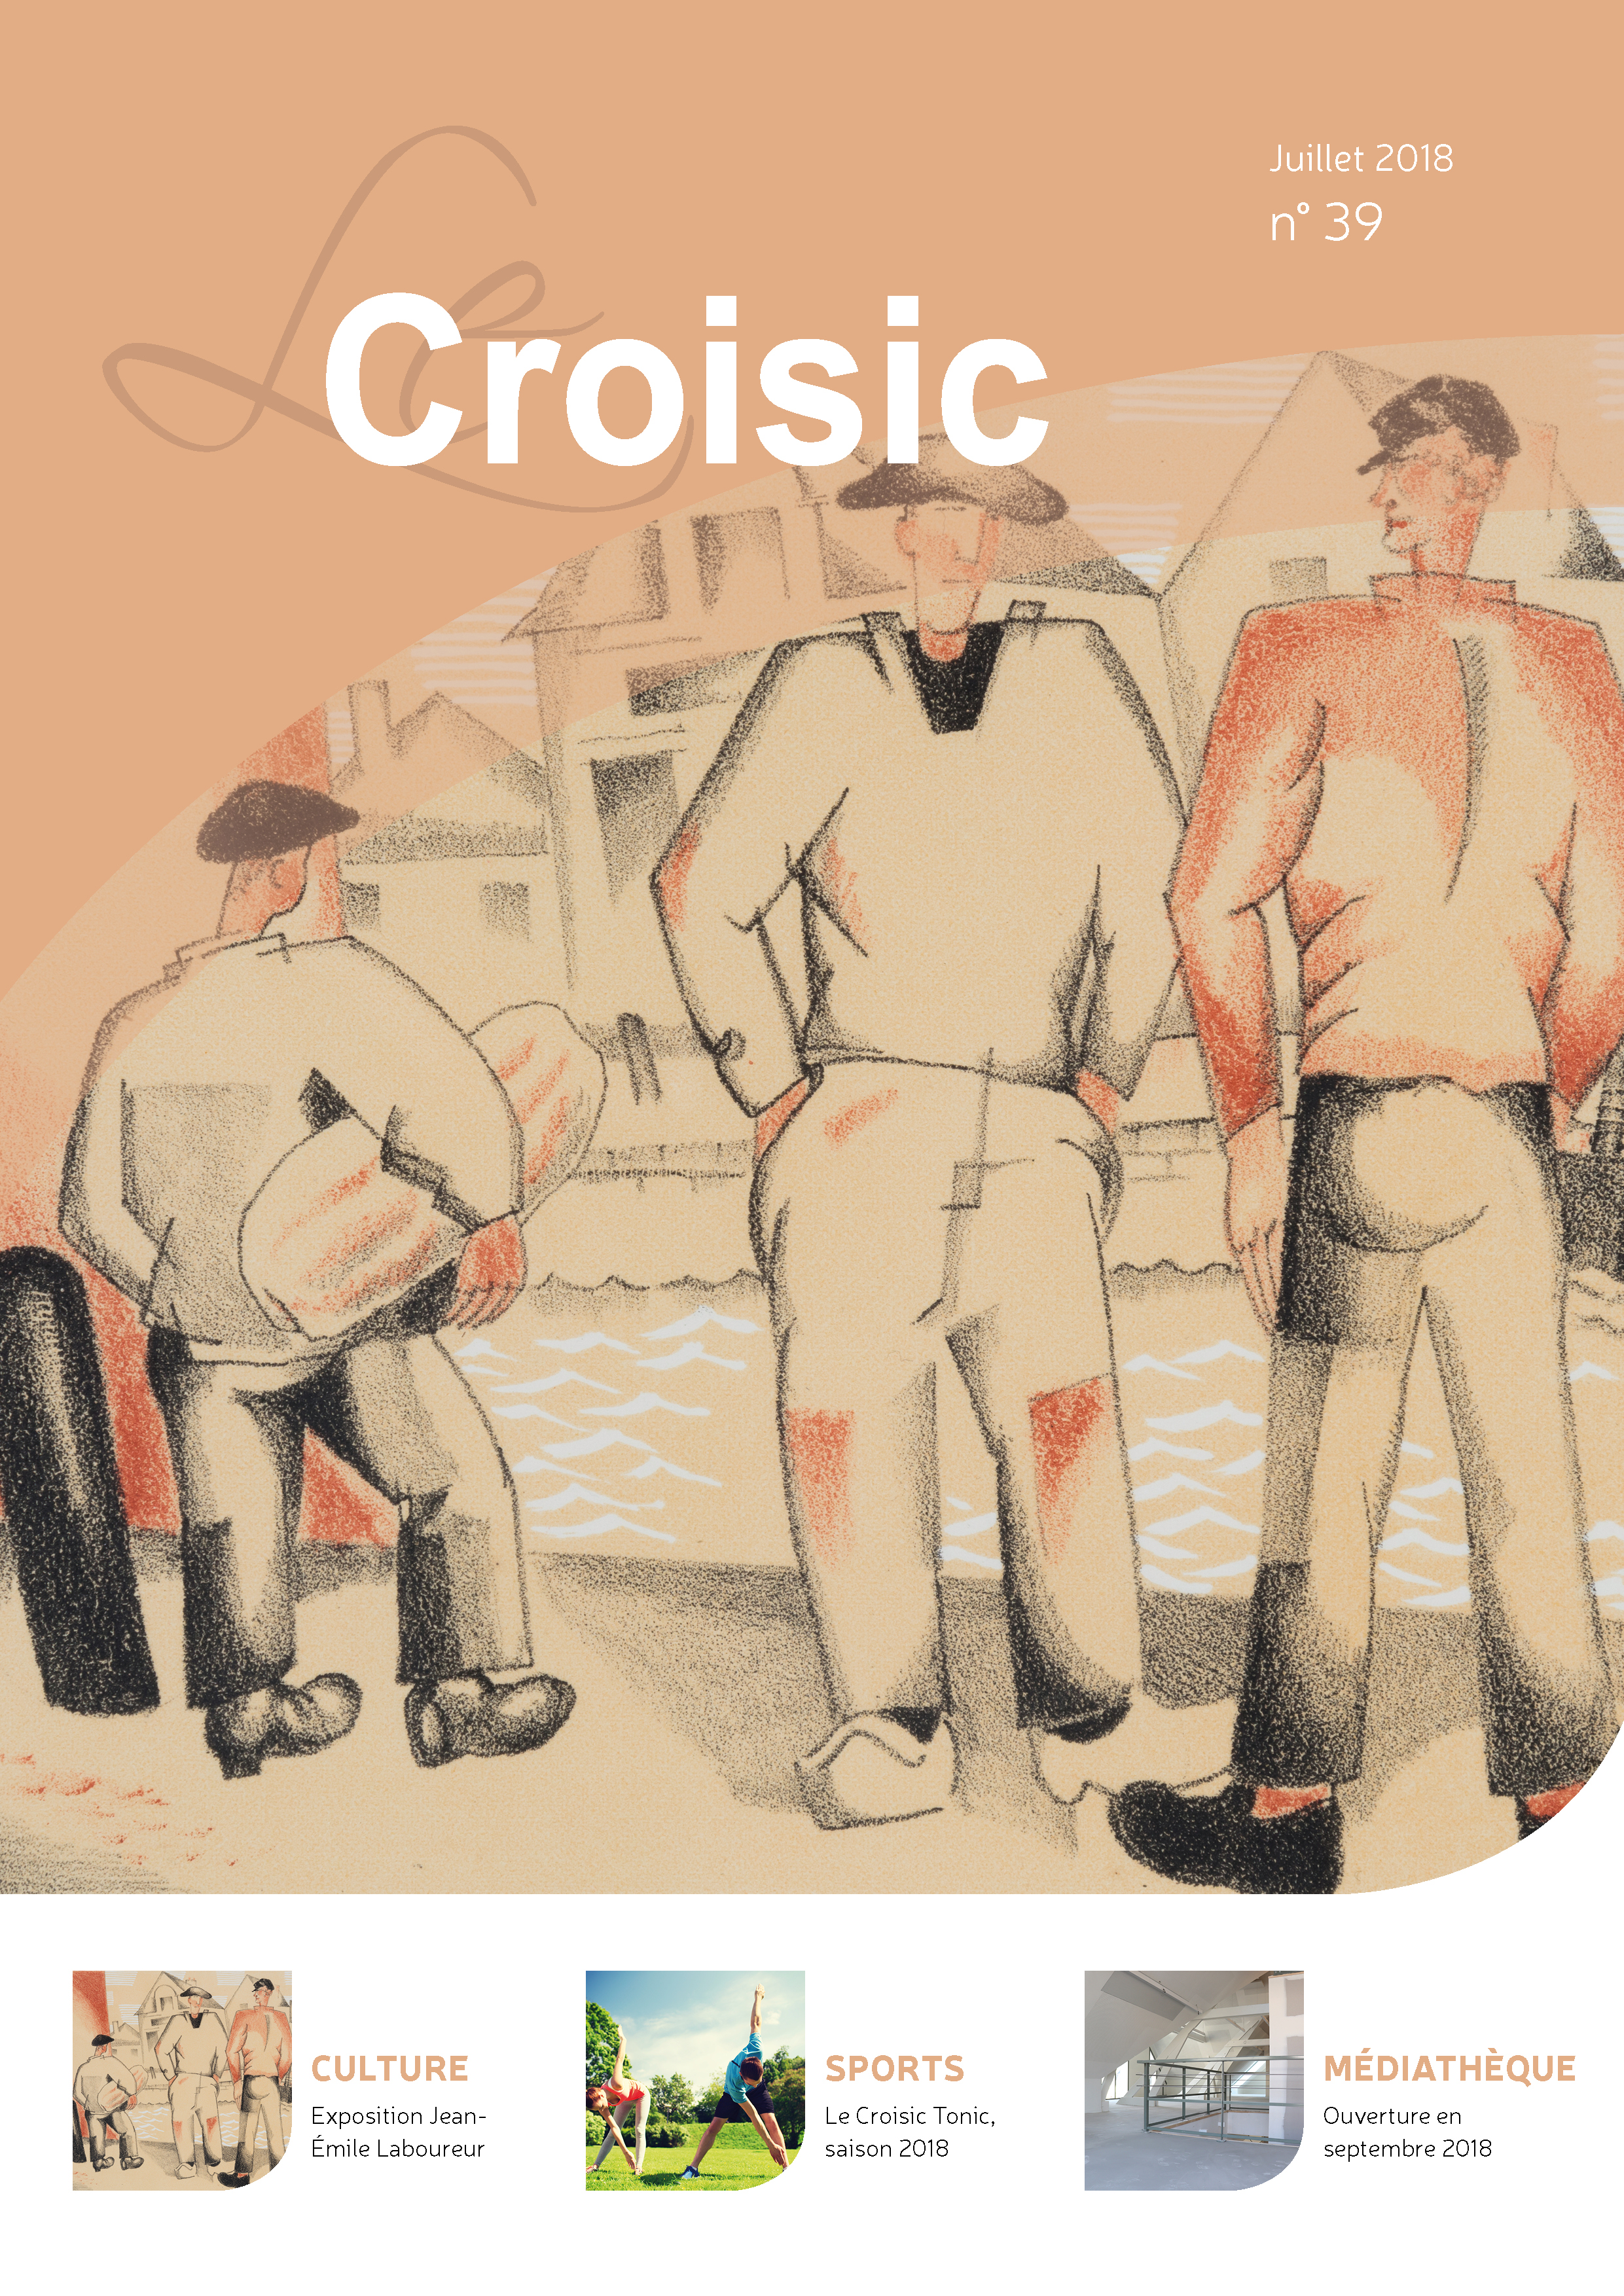 Ville du Croisic - BM 39_juillet 2018 couv.jpg